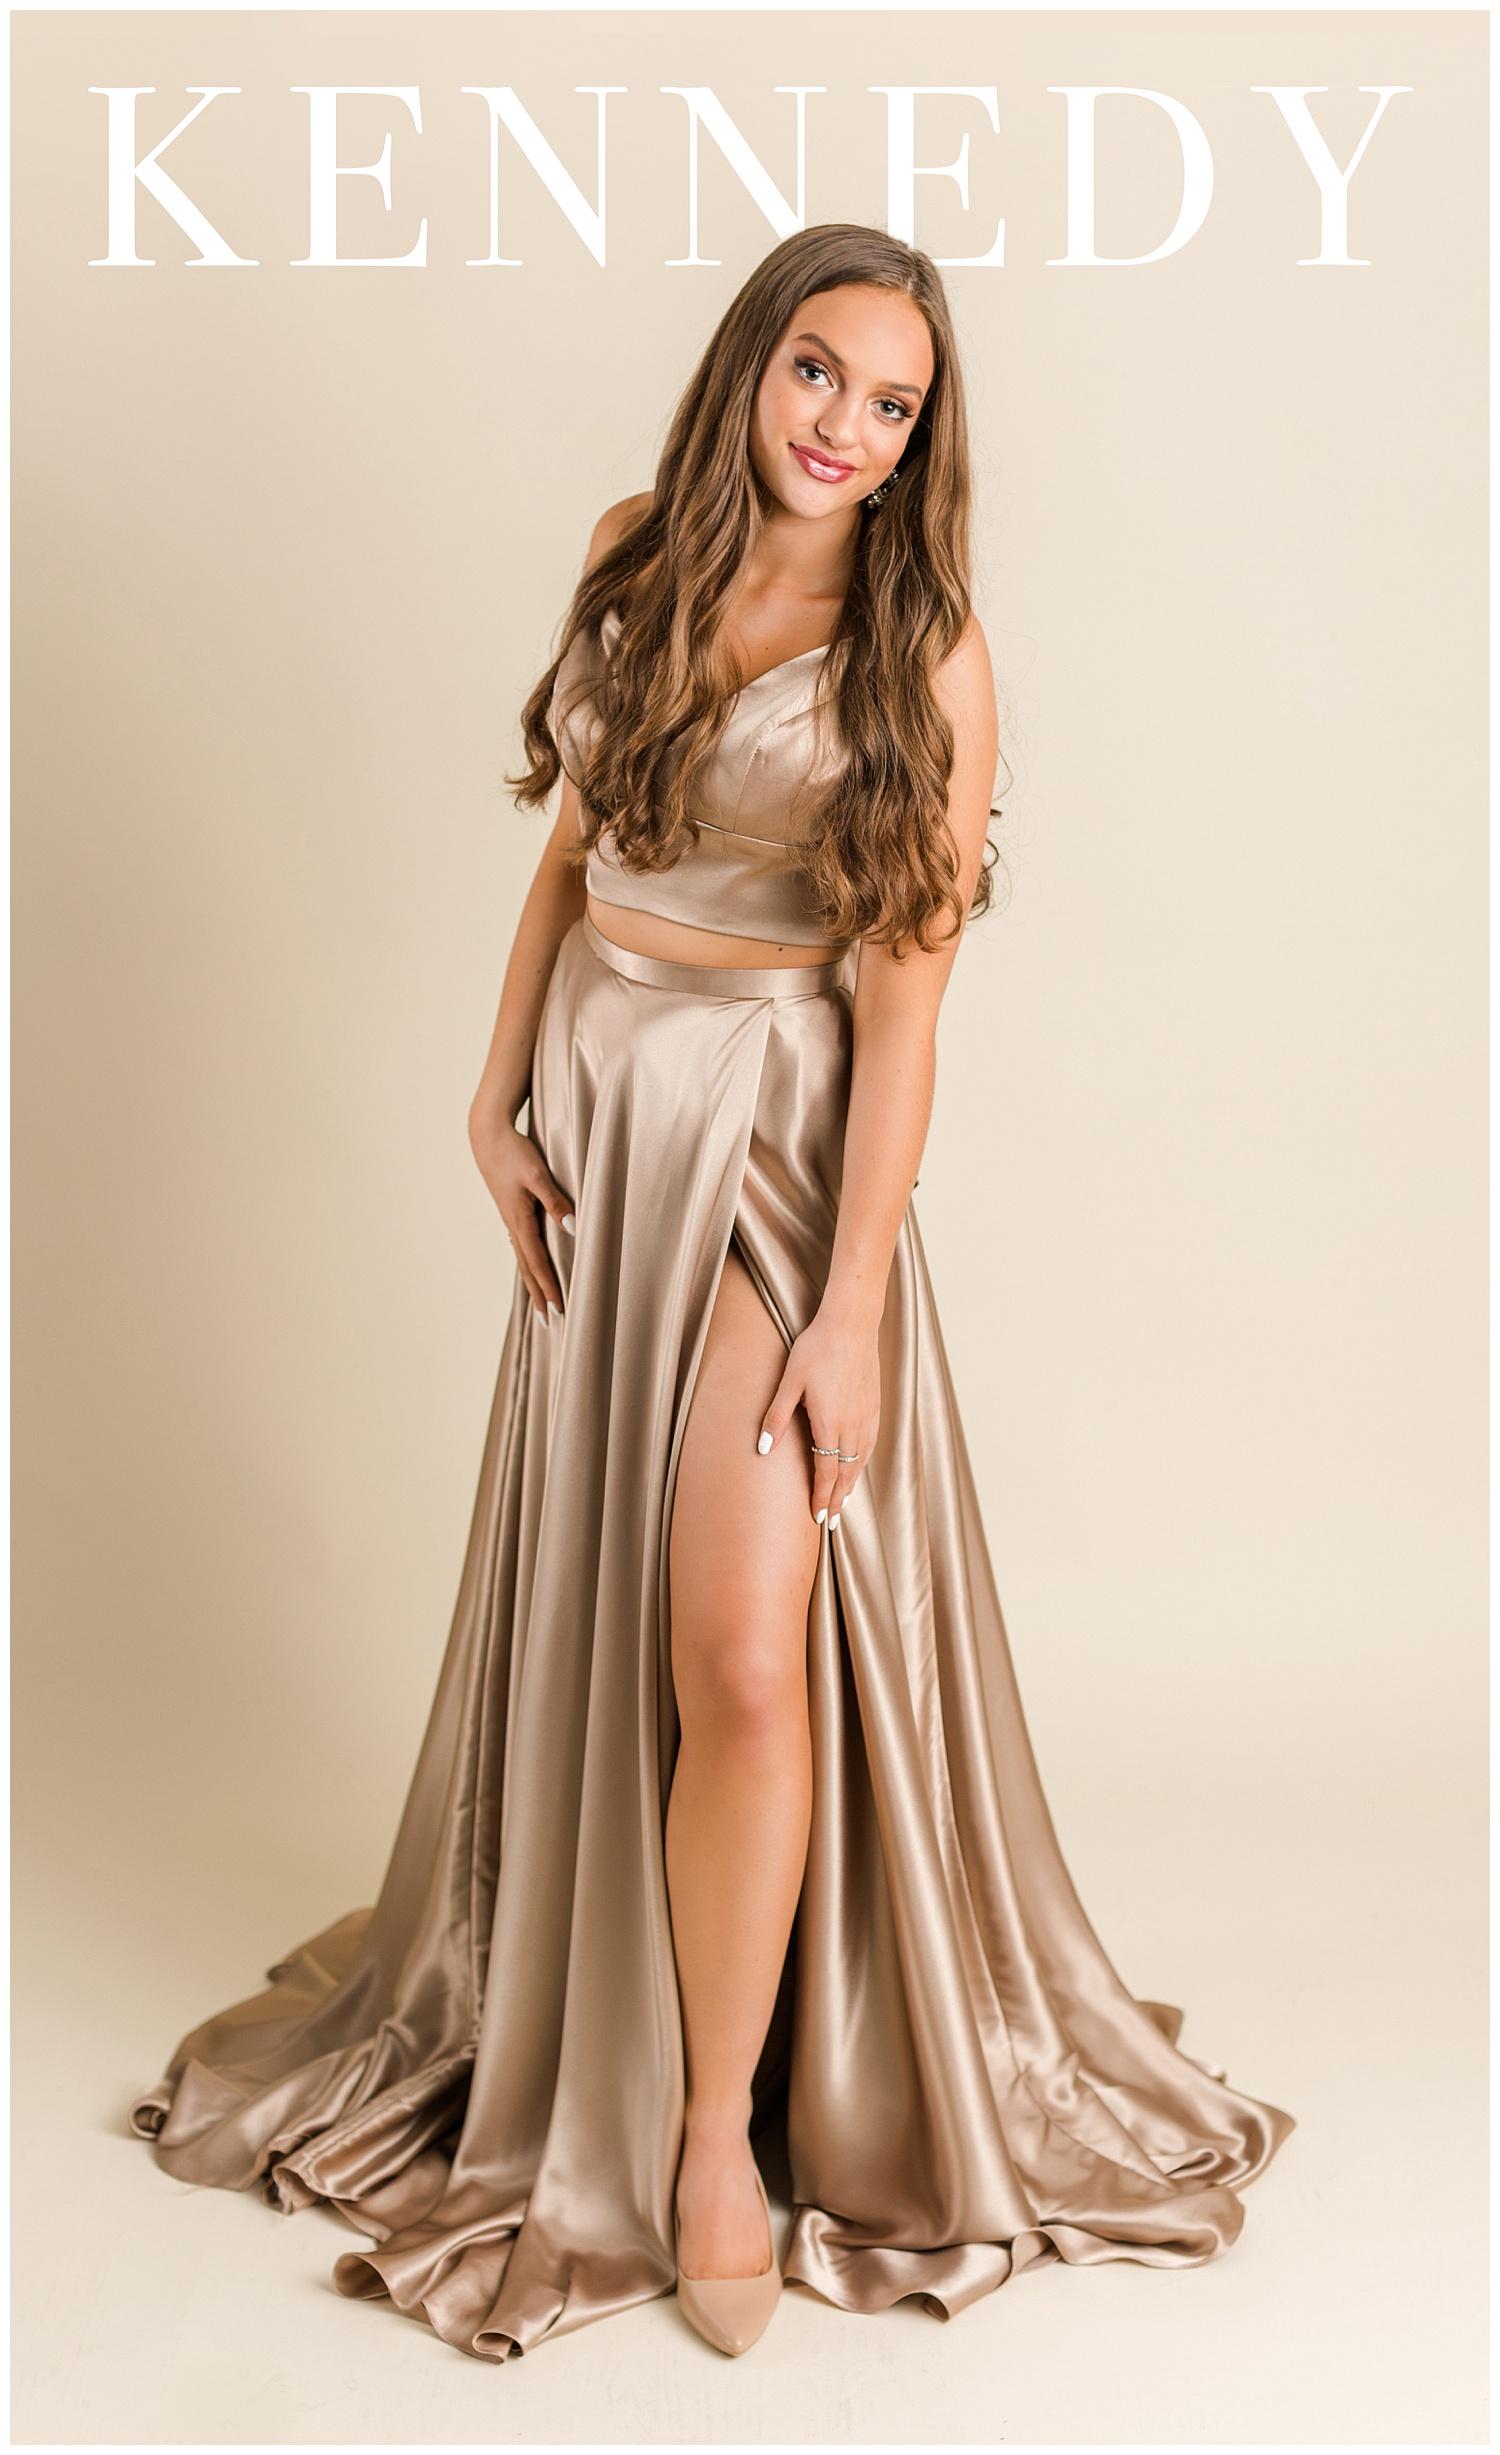 Kennedy poses in a Sherri Hill prom dress for a magazine cover | CB Studio